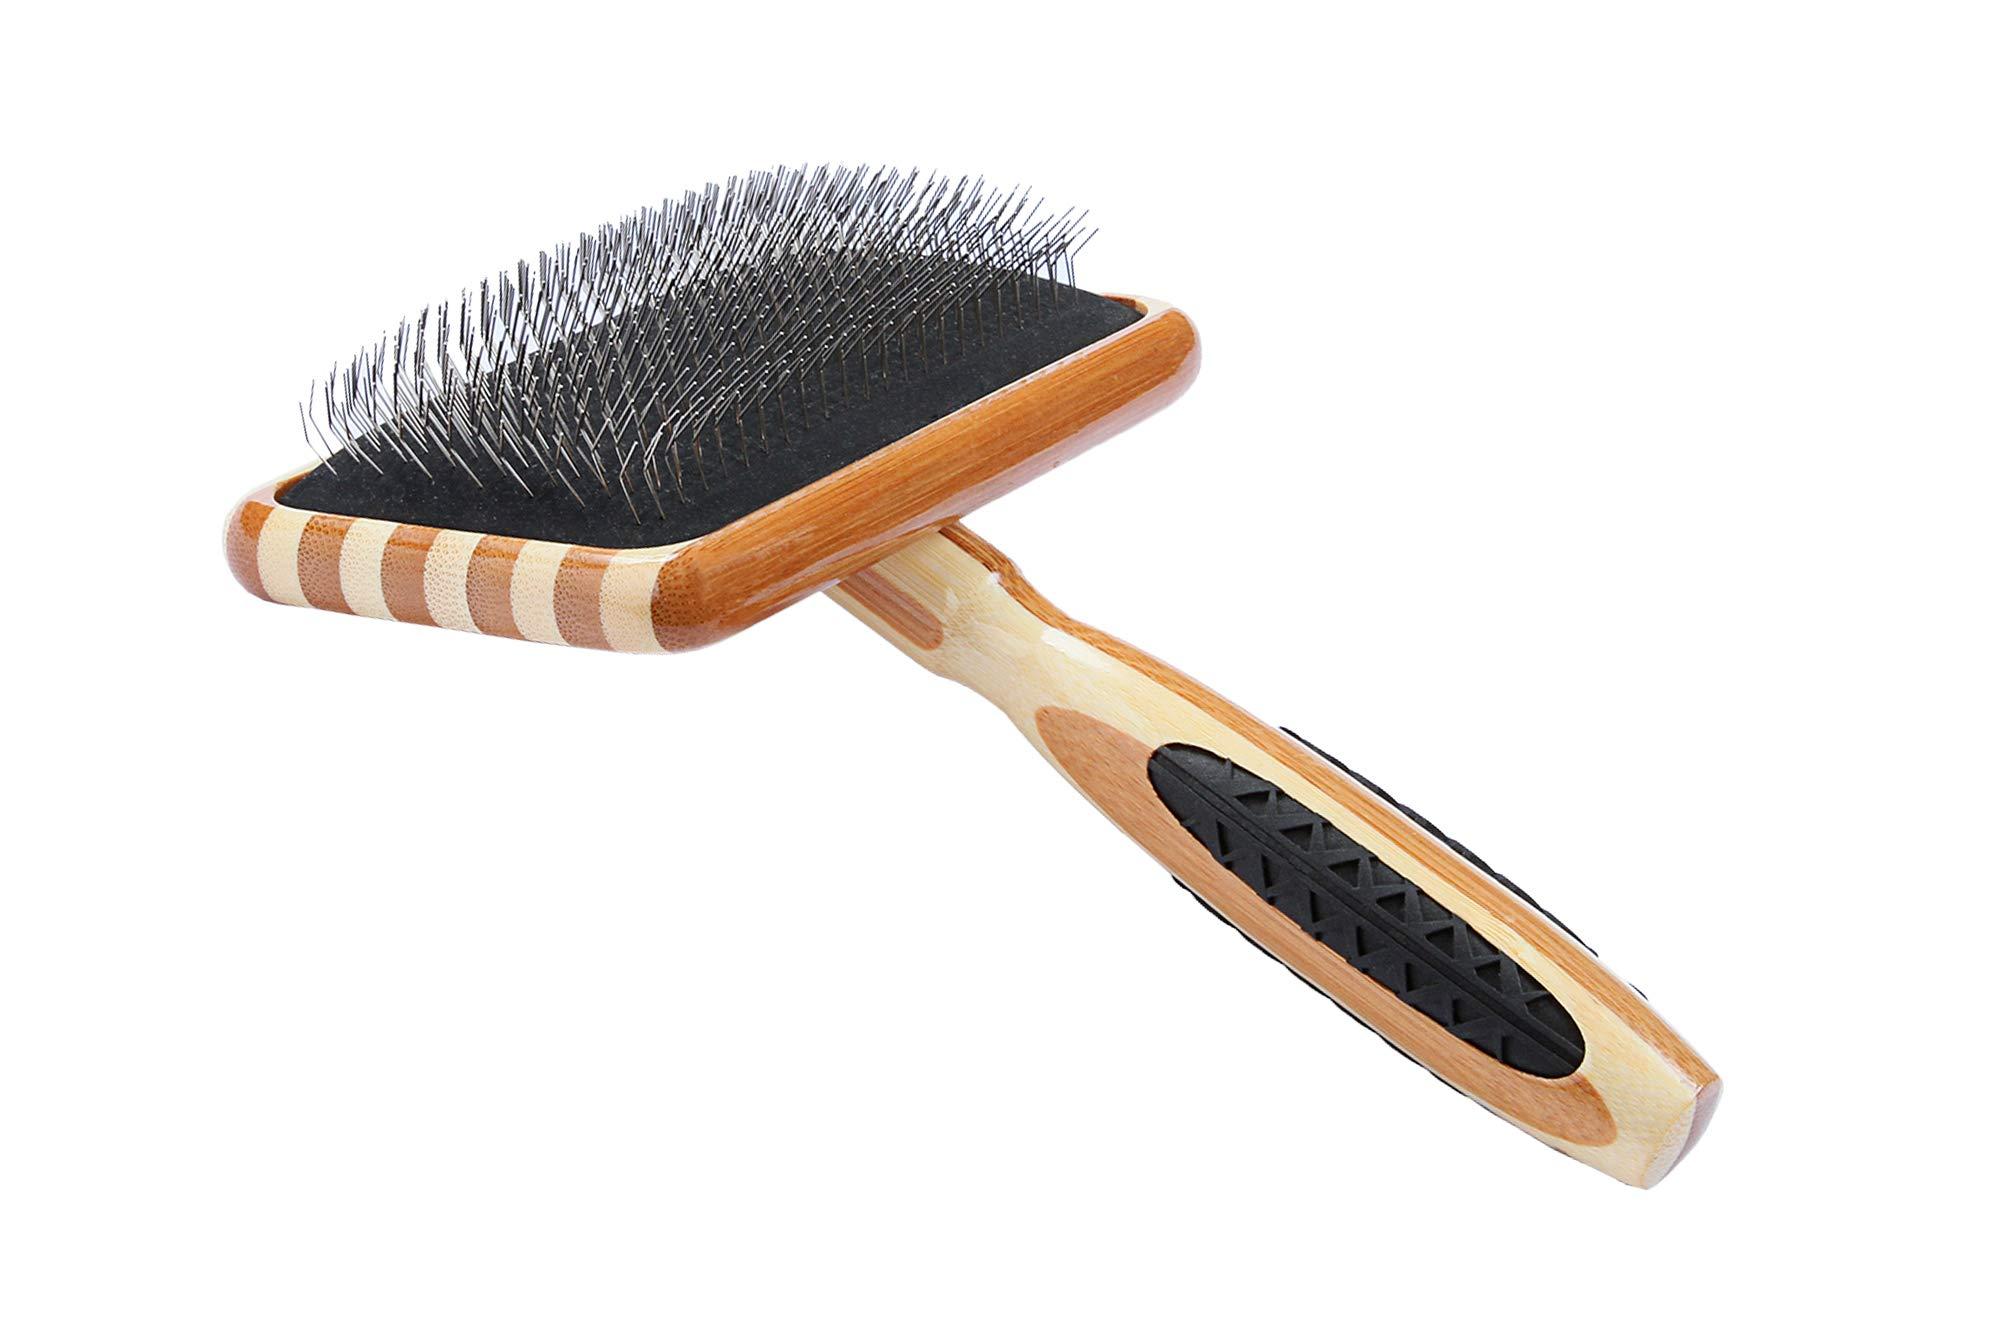 Bass Brushes | De-Matting Pet Brush Alloy Pin | Pure Bamboo Handle | Slicker Style | Stripped Finish | Model A19-SB